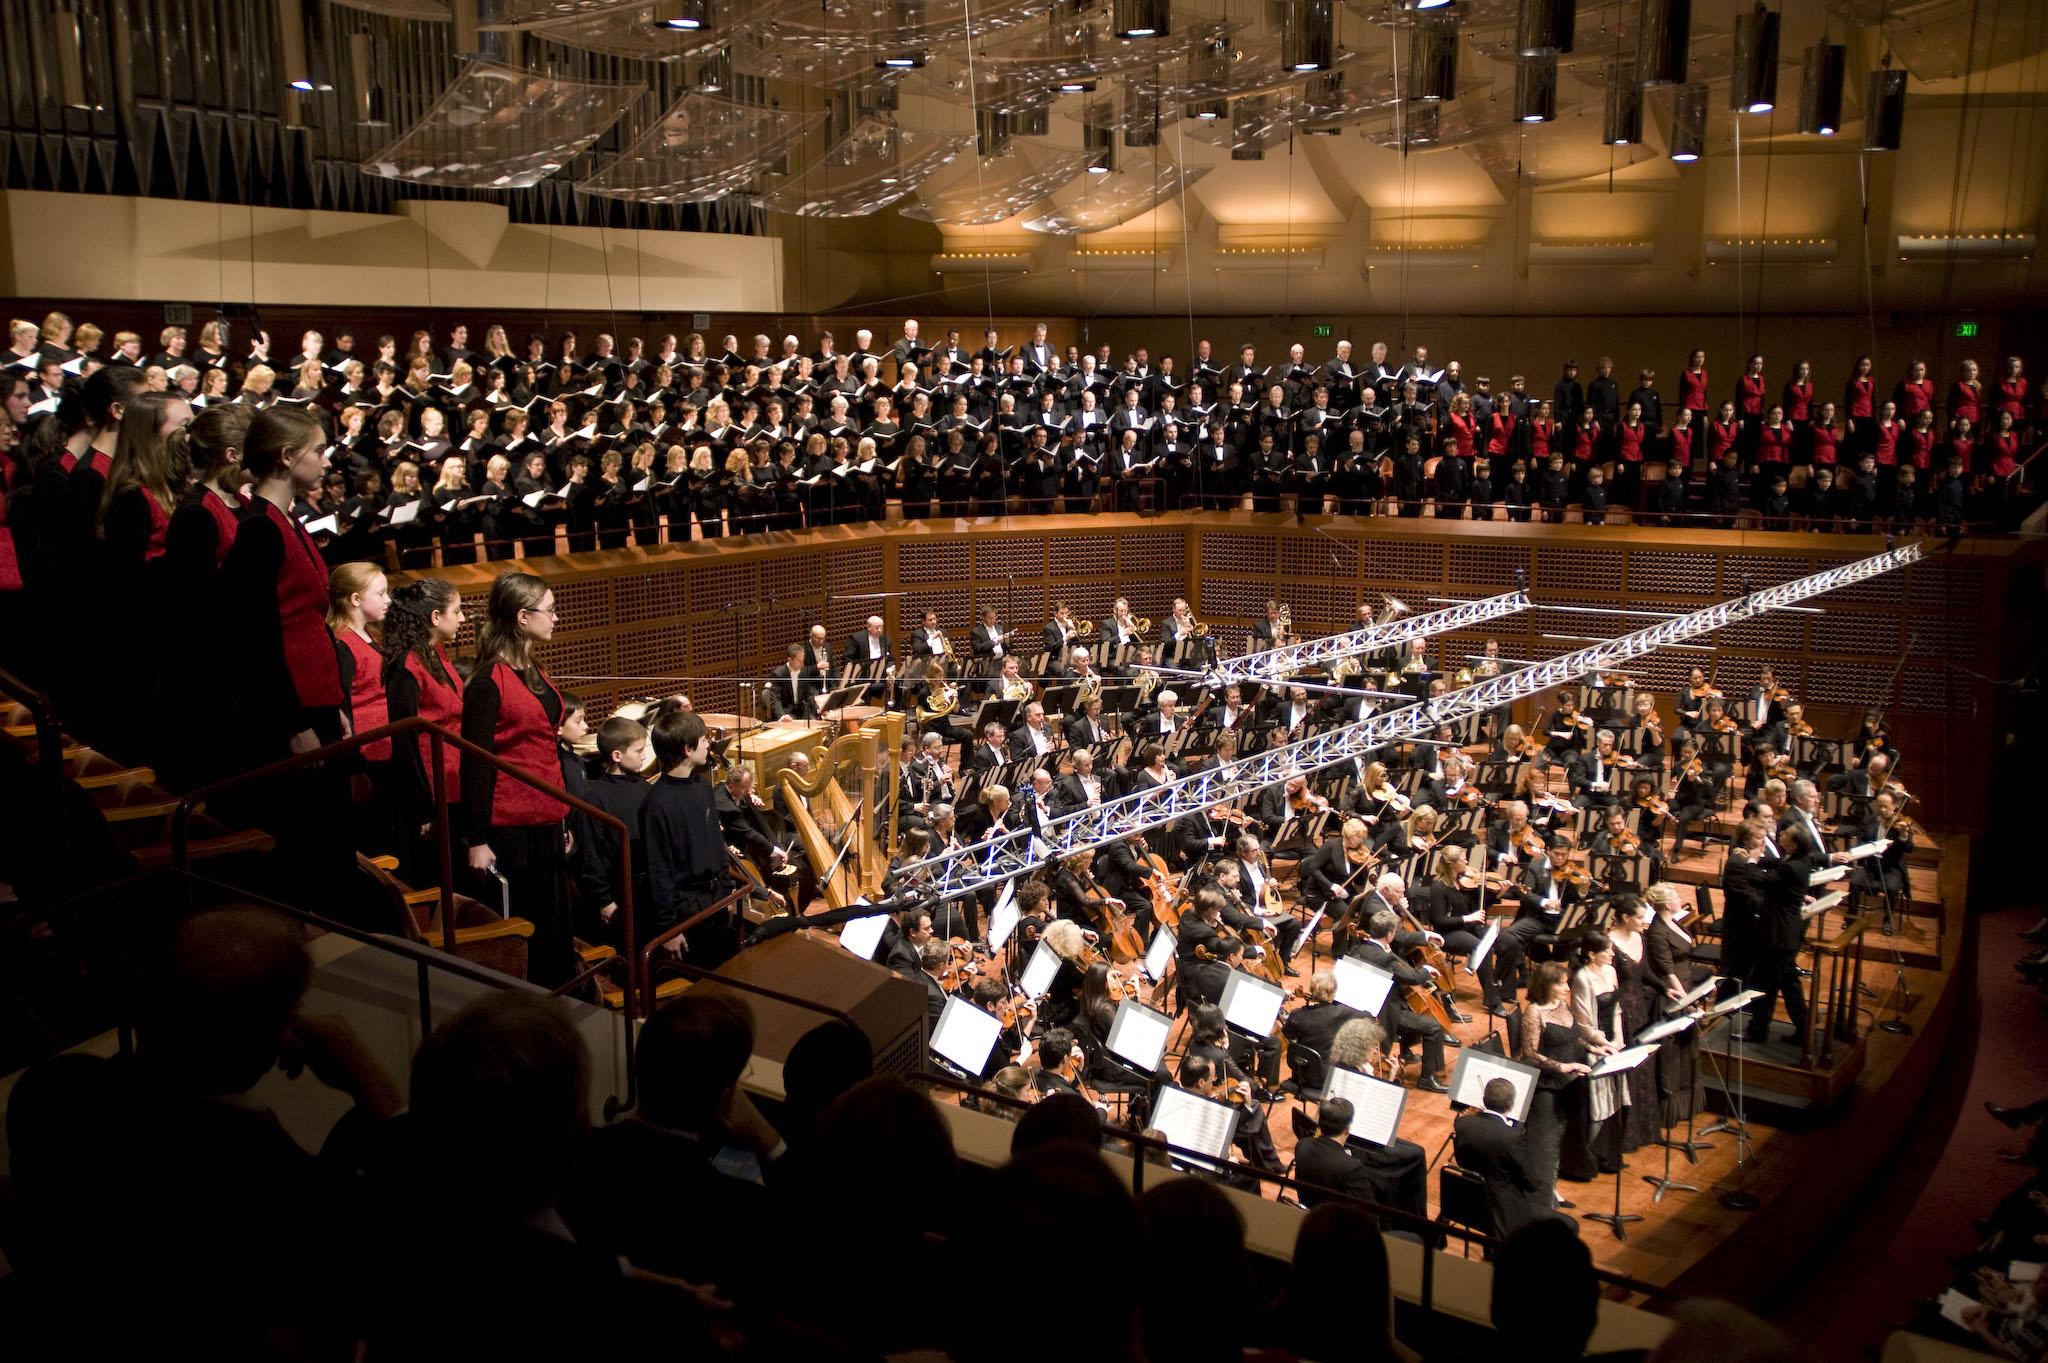 San Francisco Symphony Calendar.San Francisco Symphony Articles Interviews